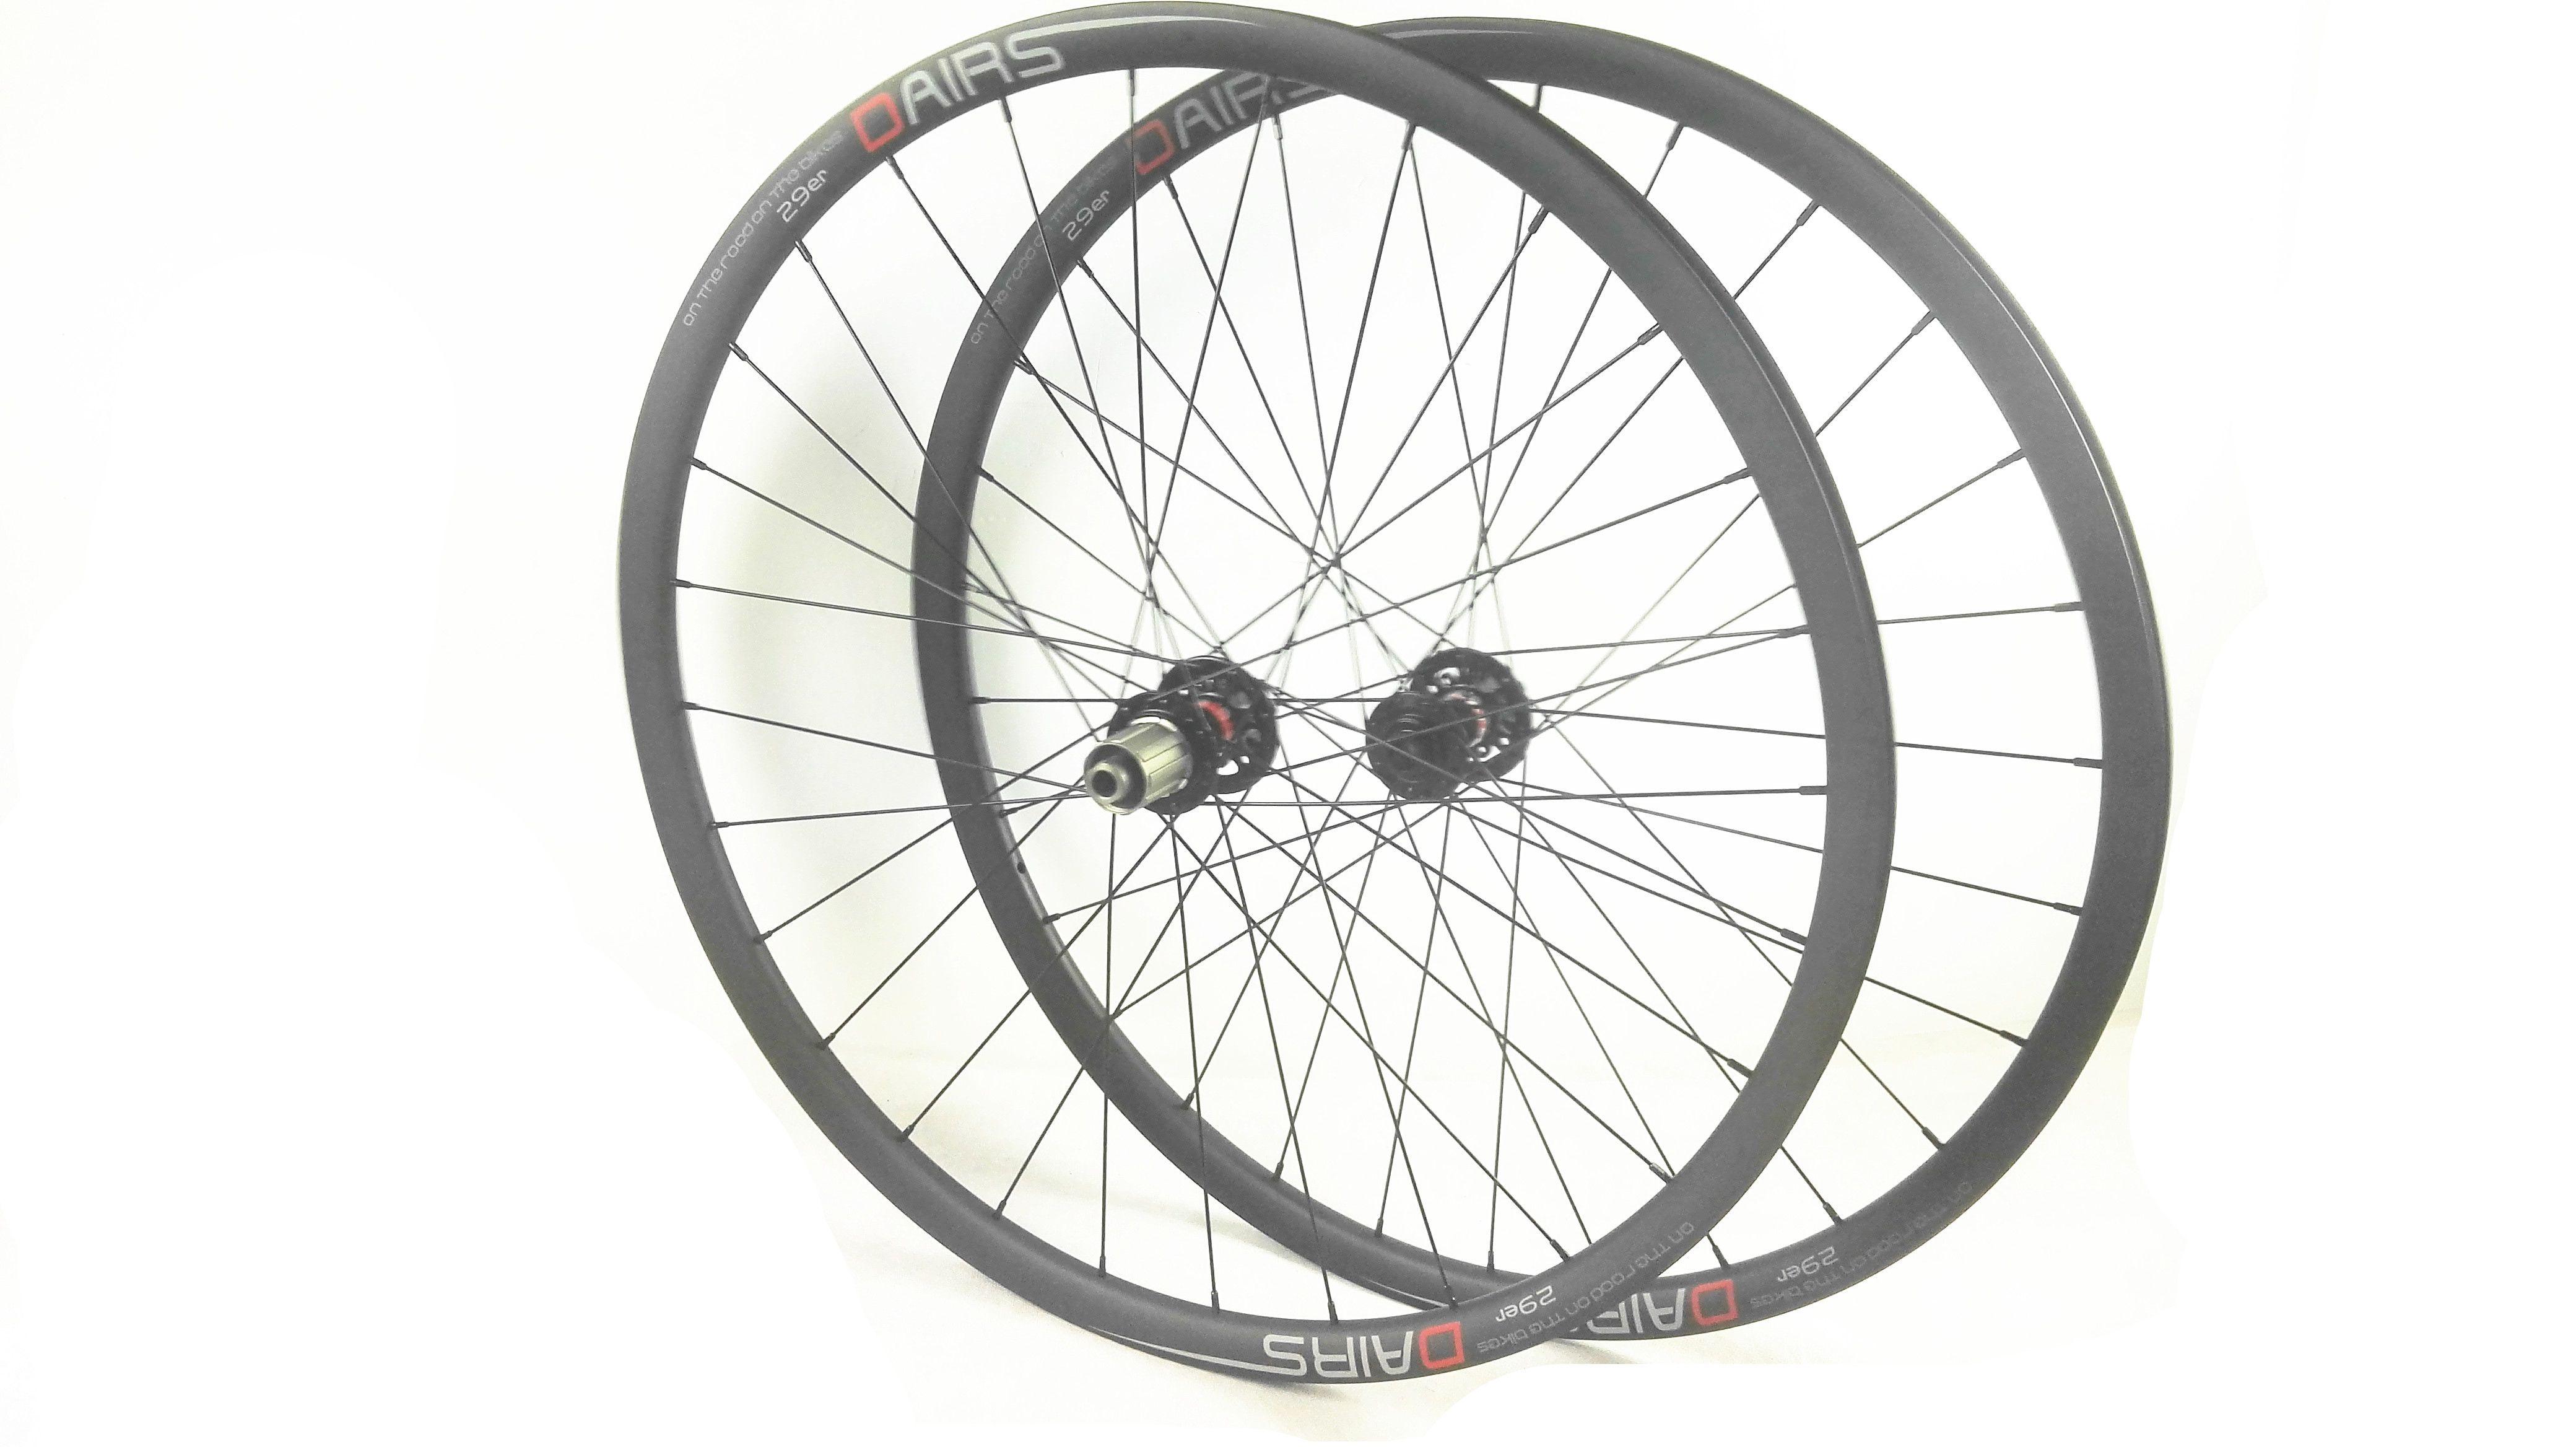 carbon mtb wheels 29er boost powerway M82 hubs 32 32 hole 148X12 110X15 mtb bike tubeless wheels